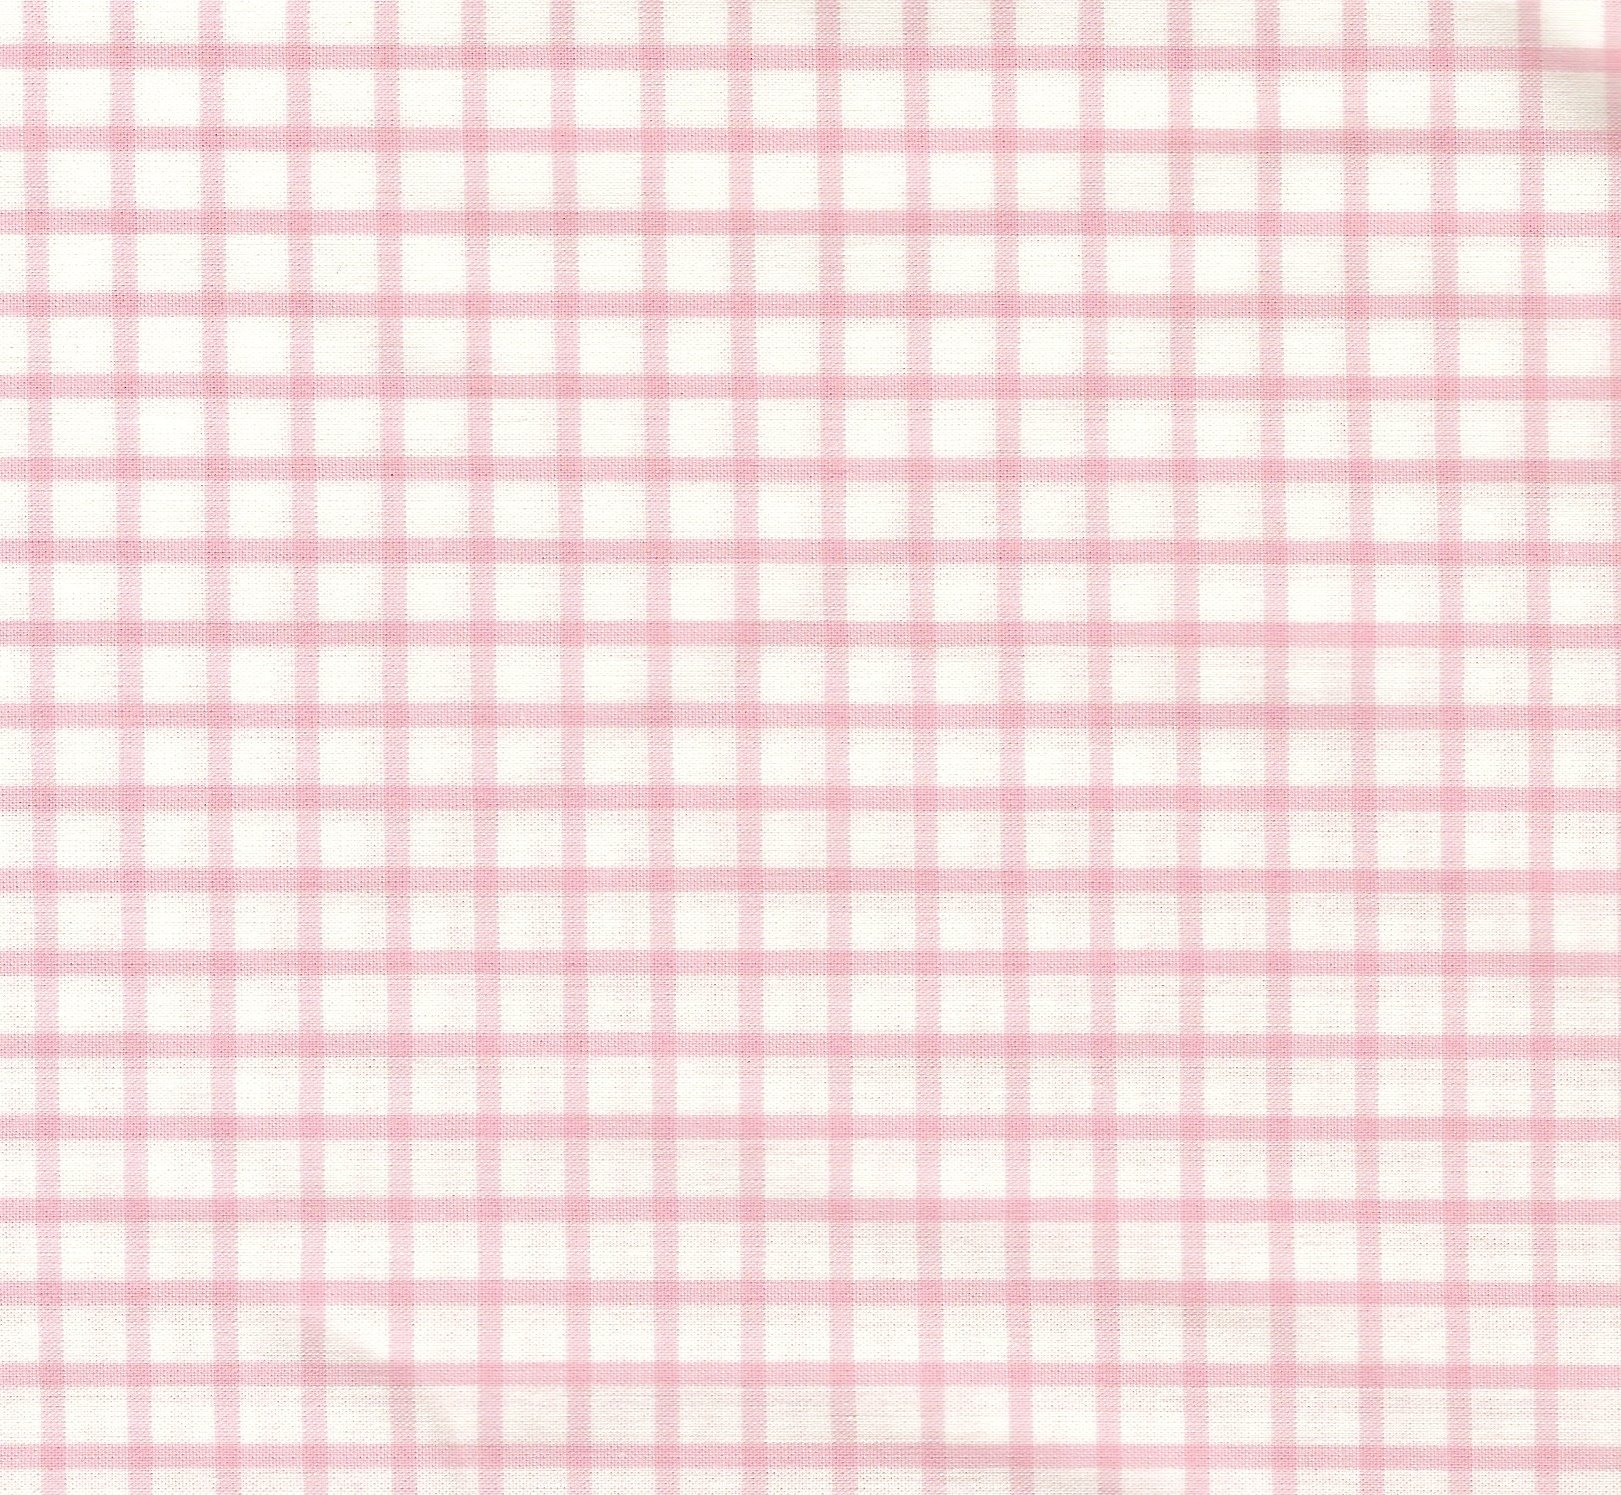 Spechler Vogel - Pastel Classics Windowpane Pink